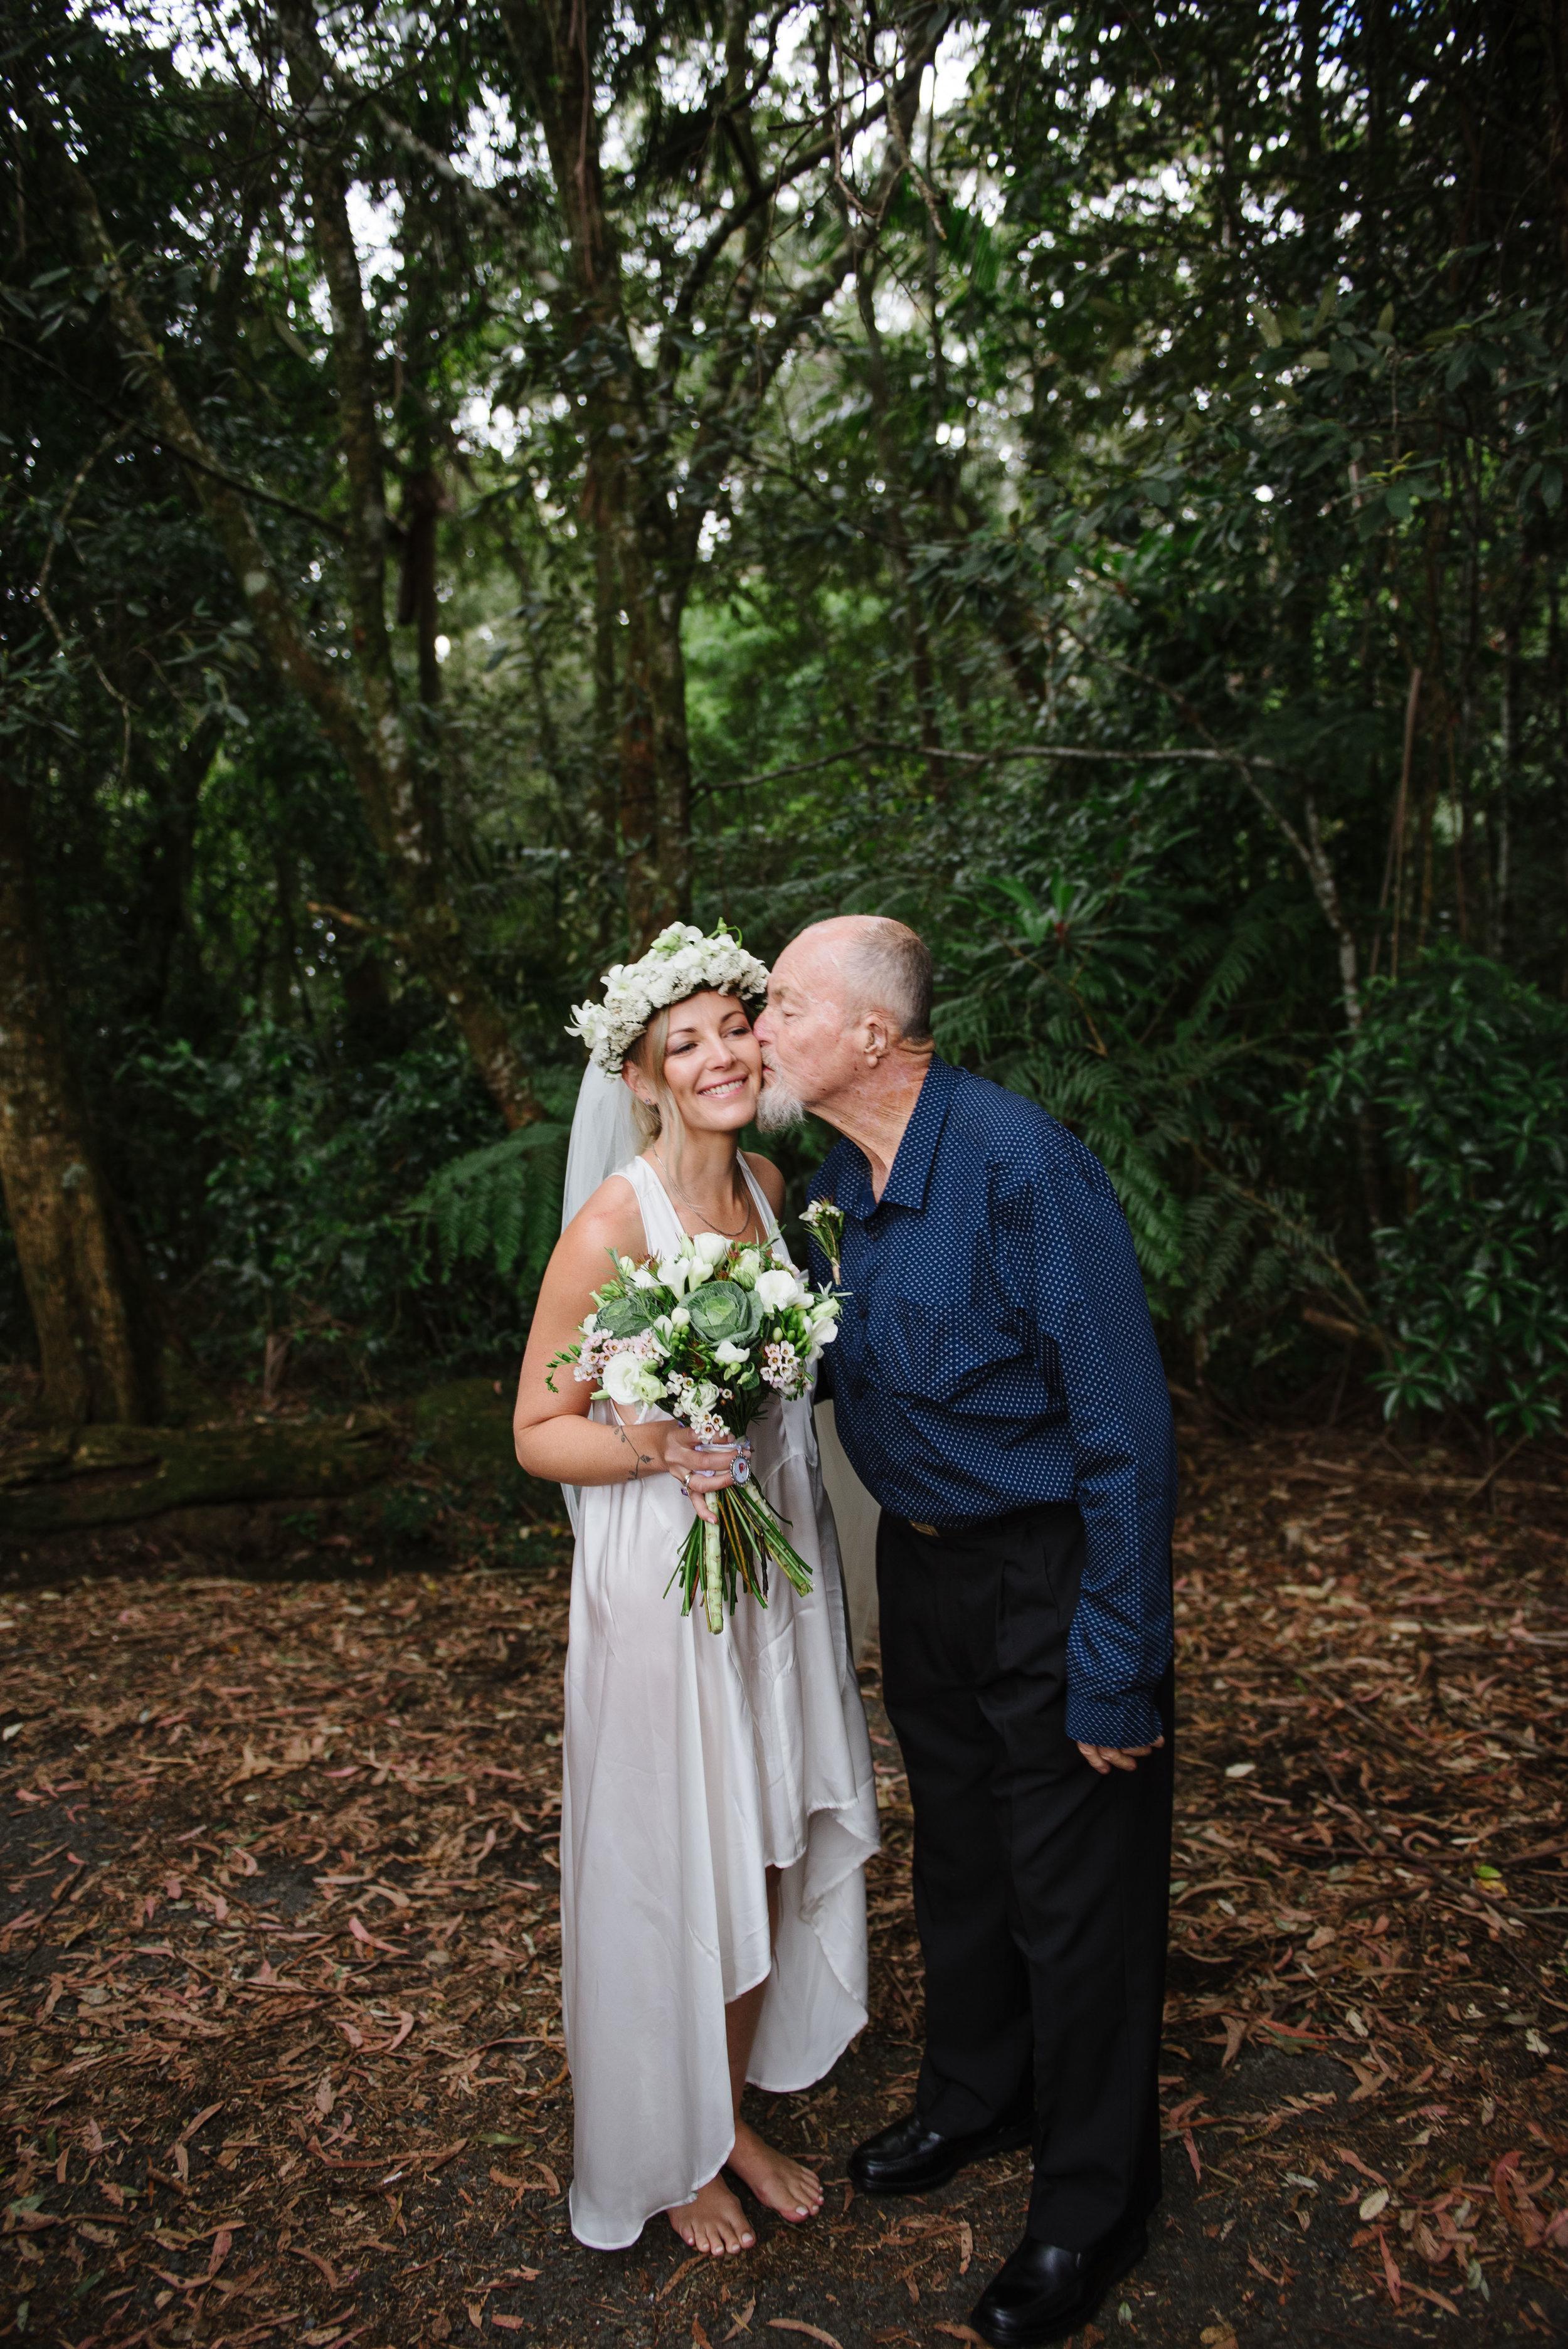 Carla and Luke- wedding photographer, byron bay wedding and family photographer, tweed heads wedding and family photography-137.jpg